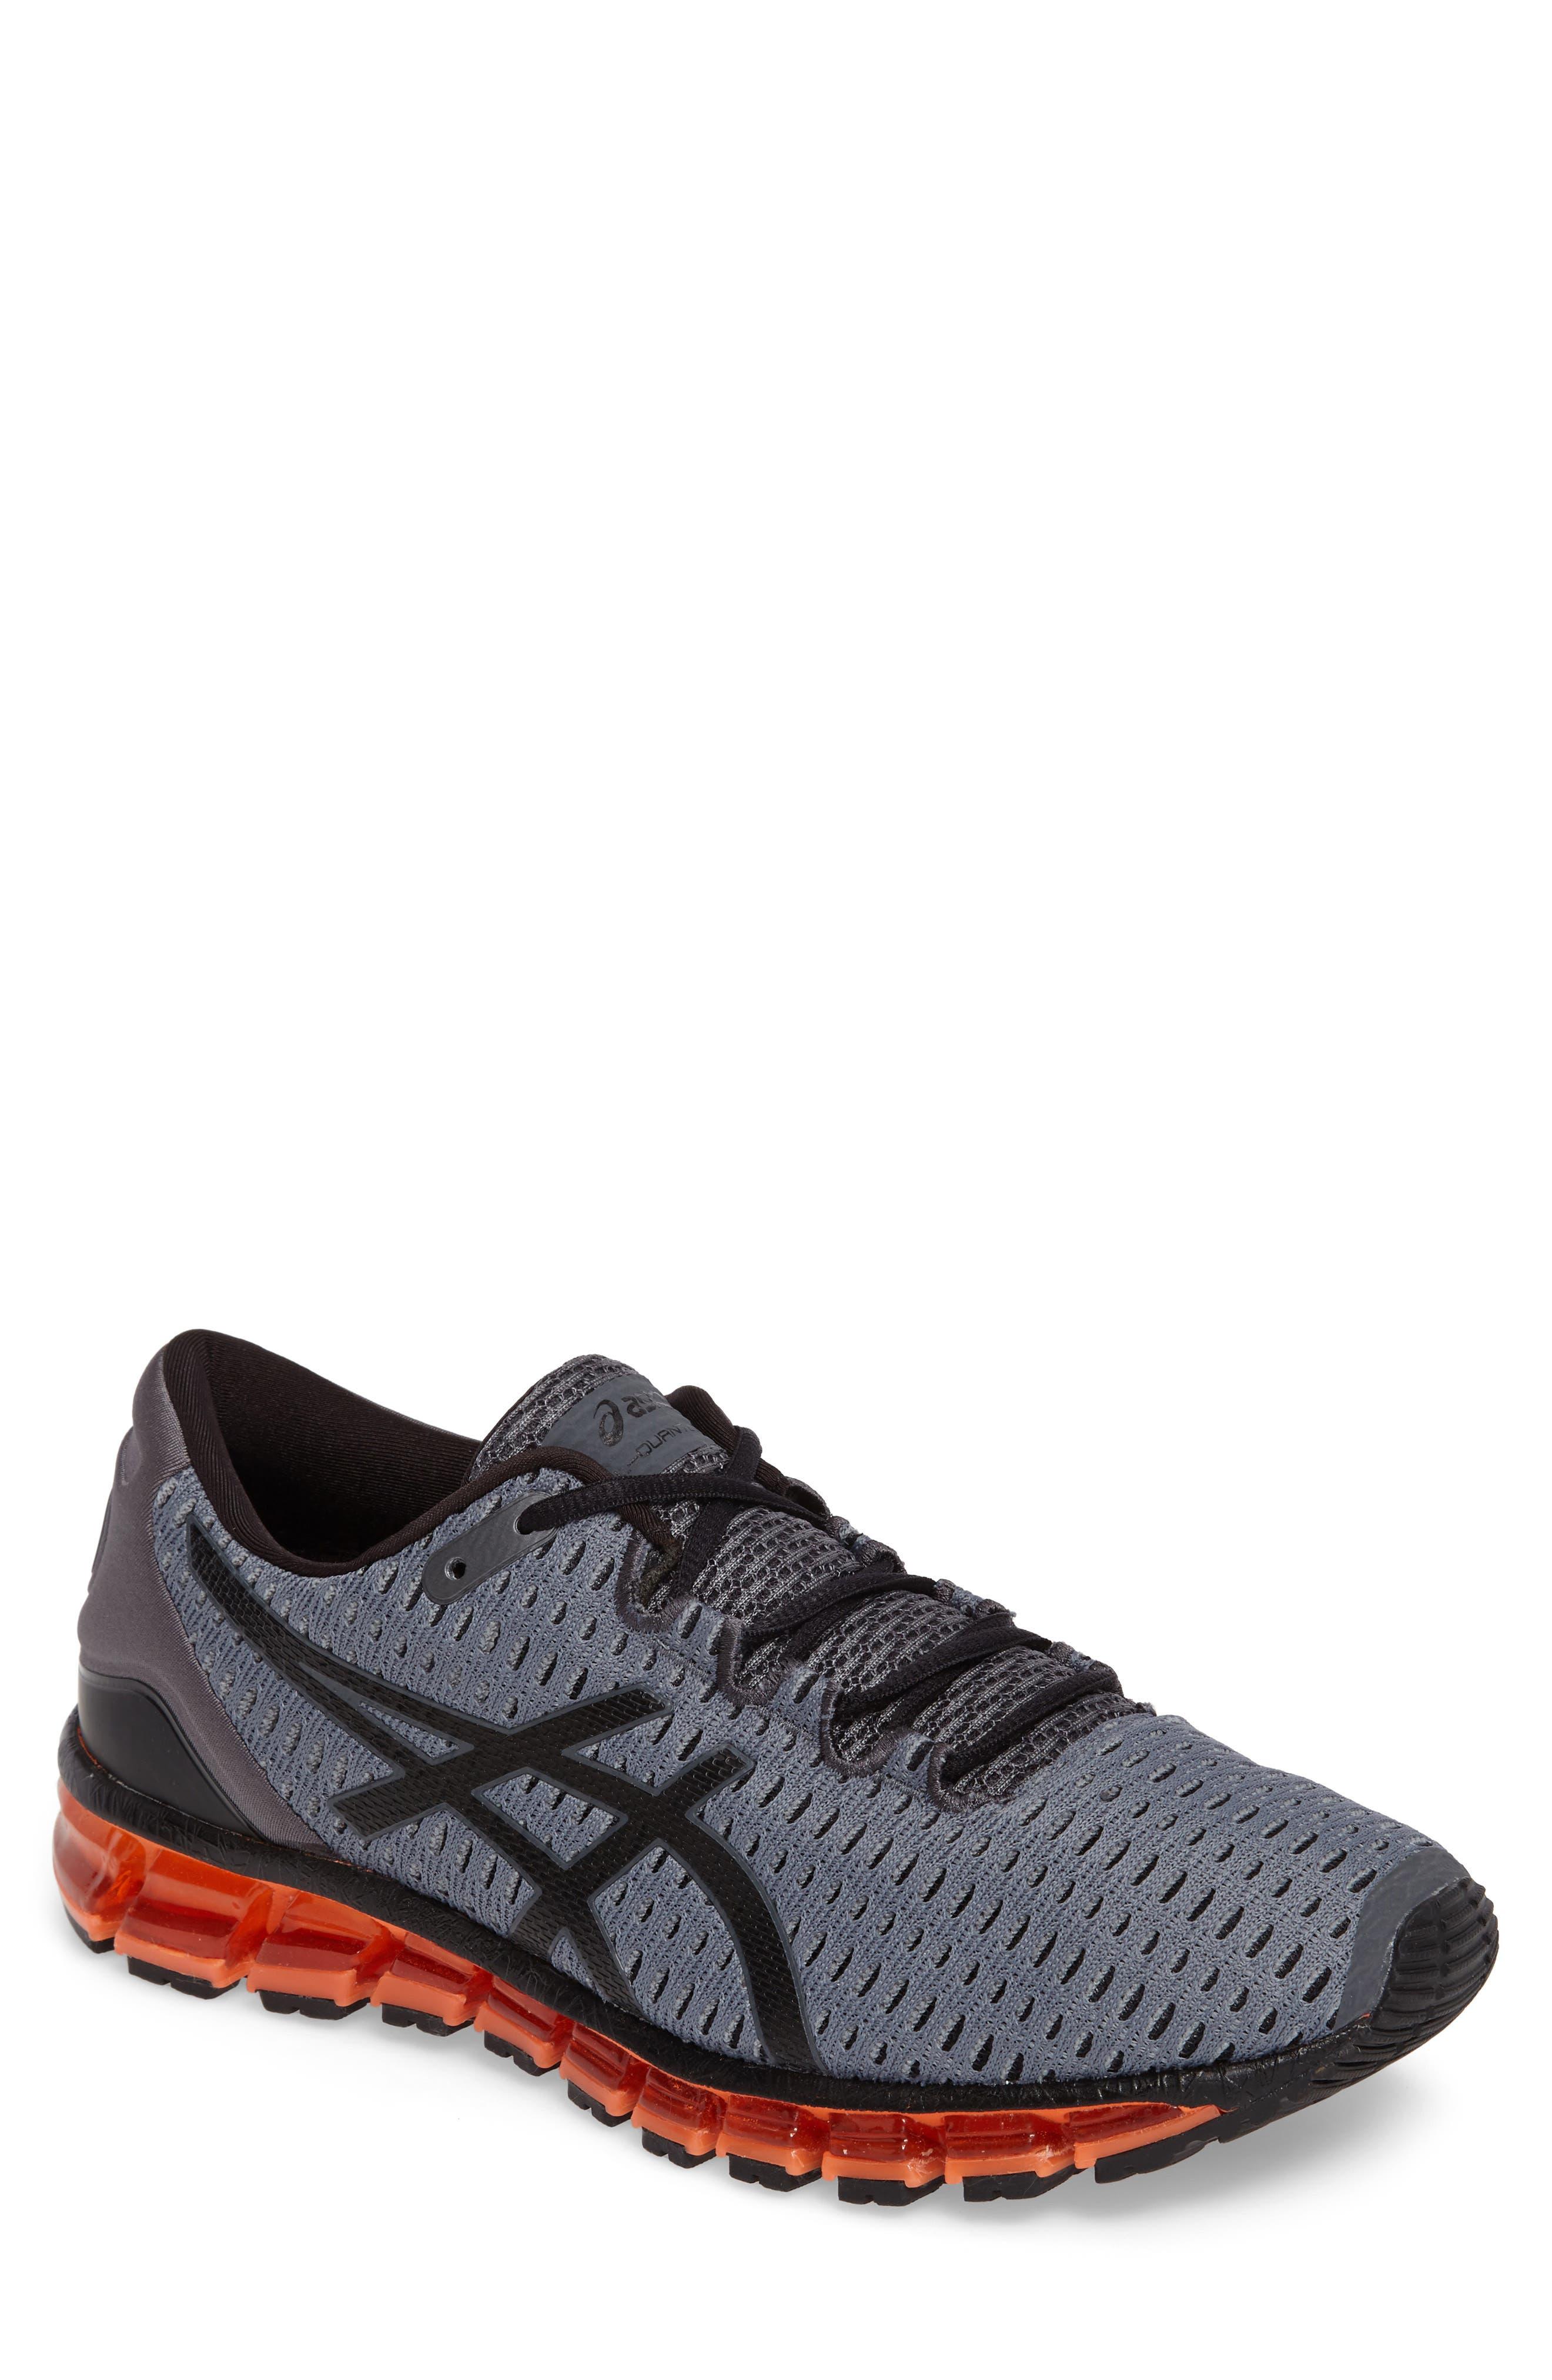 Alternate Image 1 Selected - ASICS® GEL-Quantum 360 Running Shoe (Men)